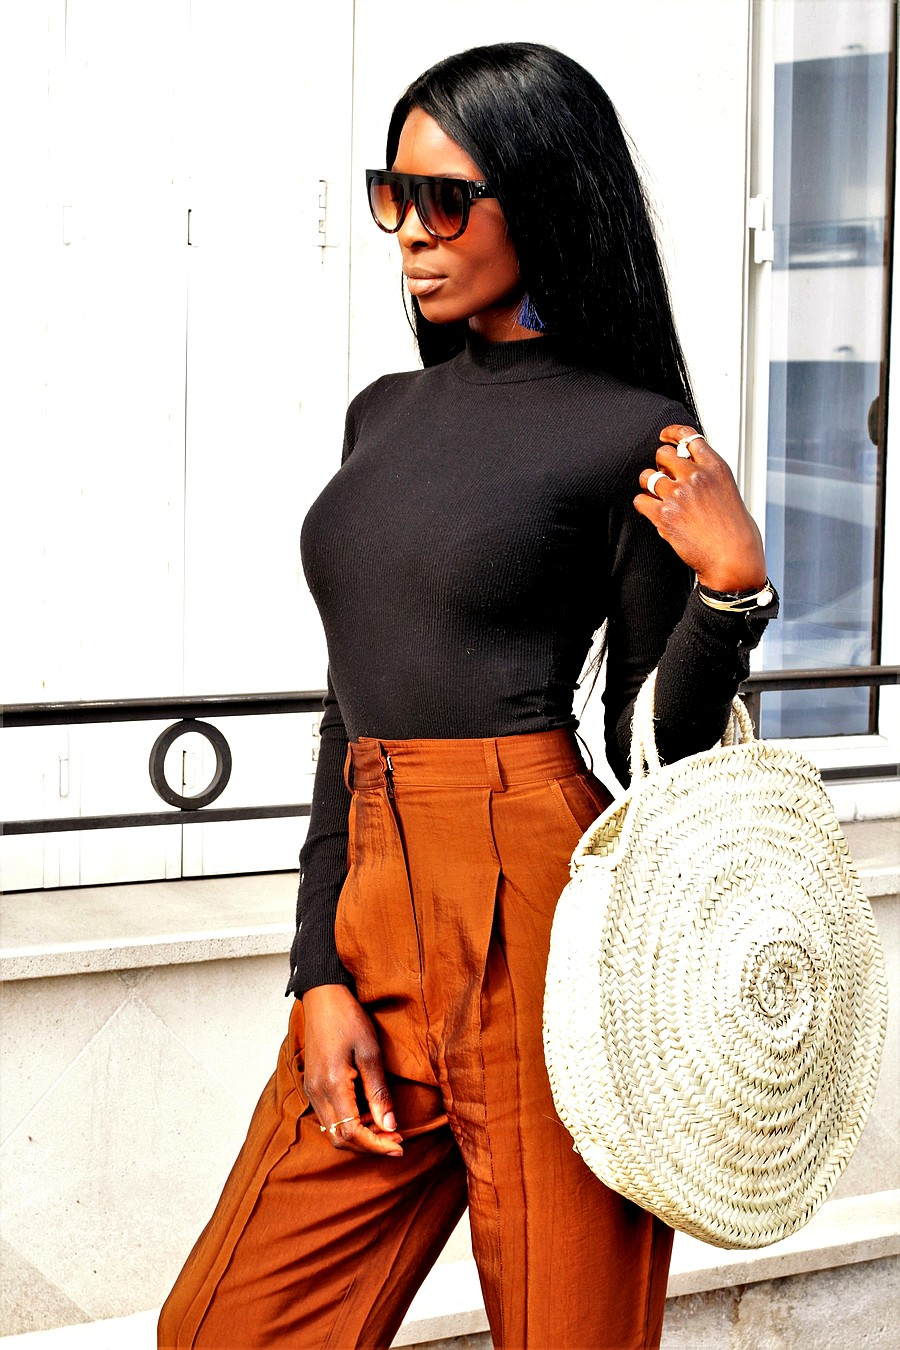 lunettes-celine-kim-kardashian-tendance-panier-rond-paille-pantalon-taille-haute